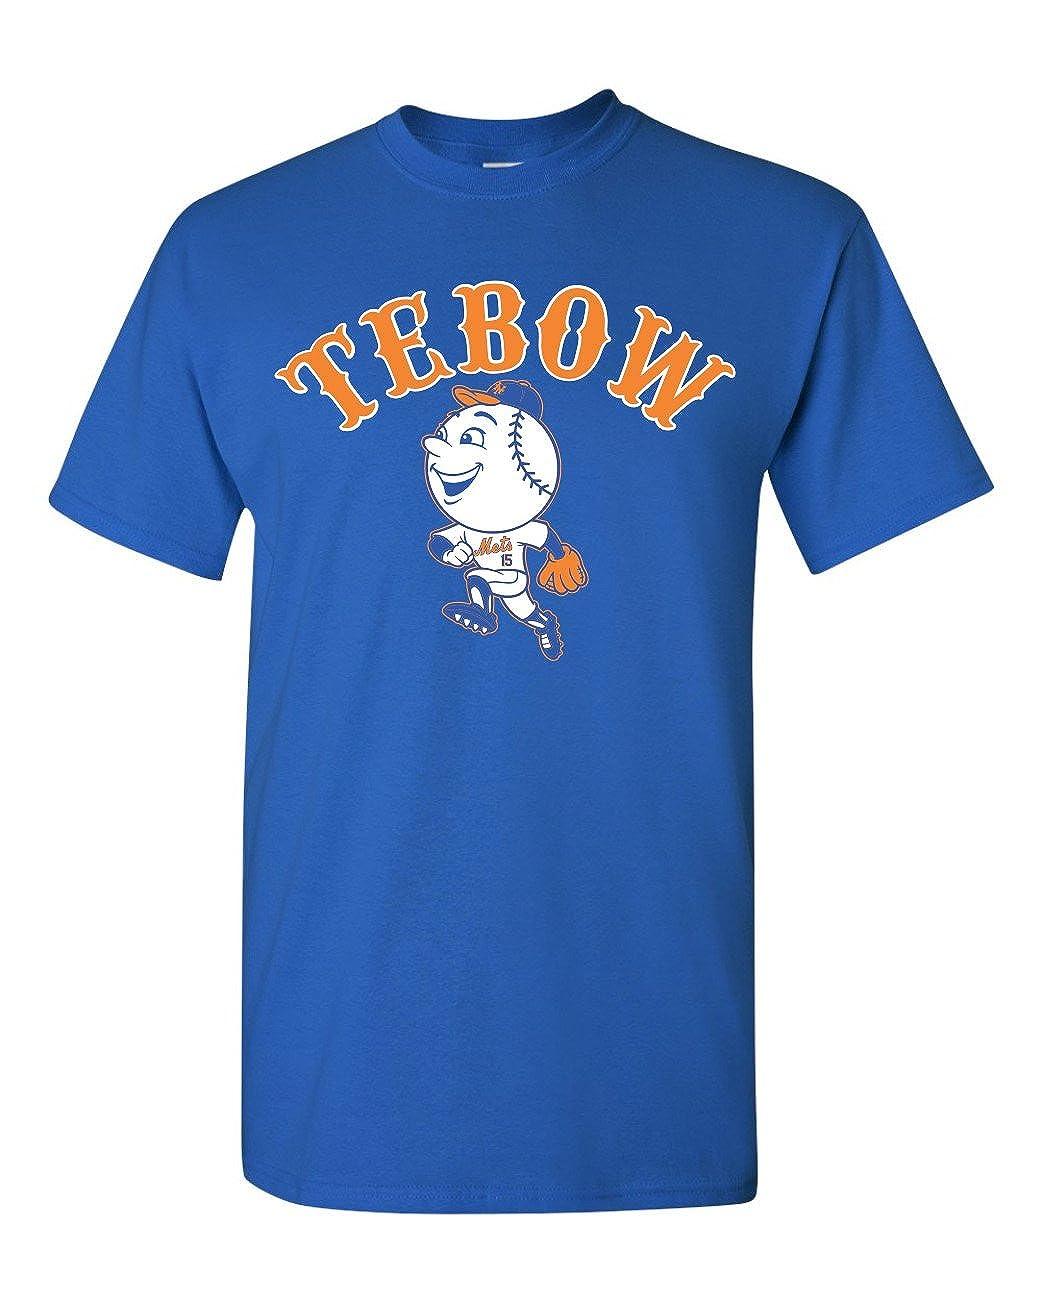 quality design 31dfd 1441e All Things Apparel Tim Tebow Baseball Men's T-Shirt